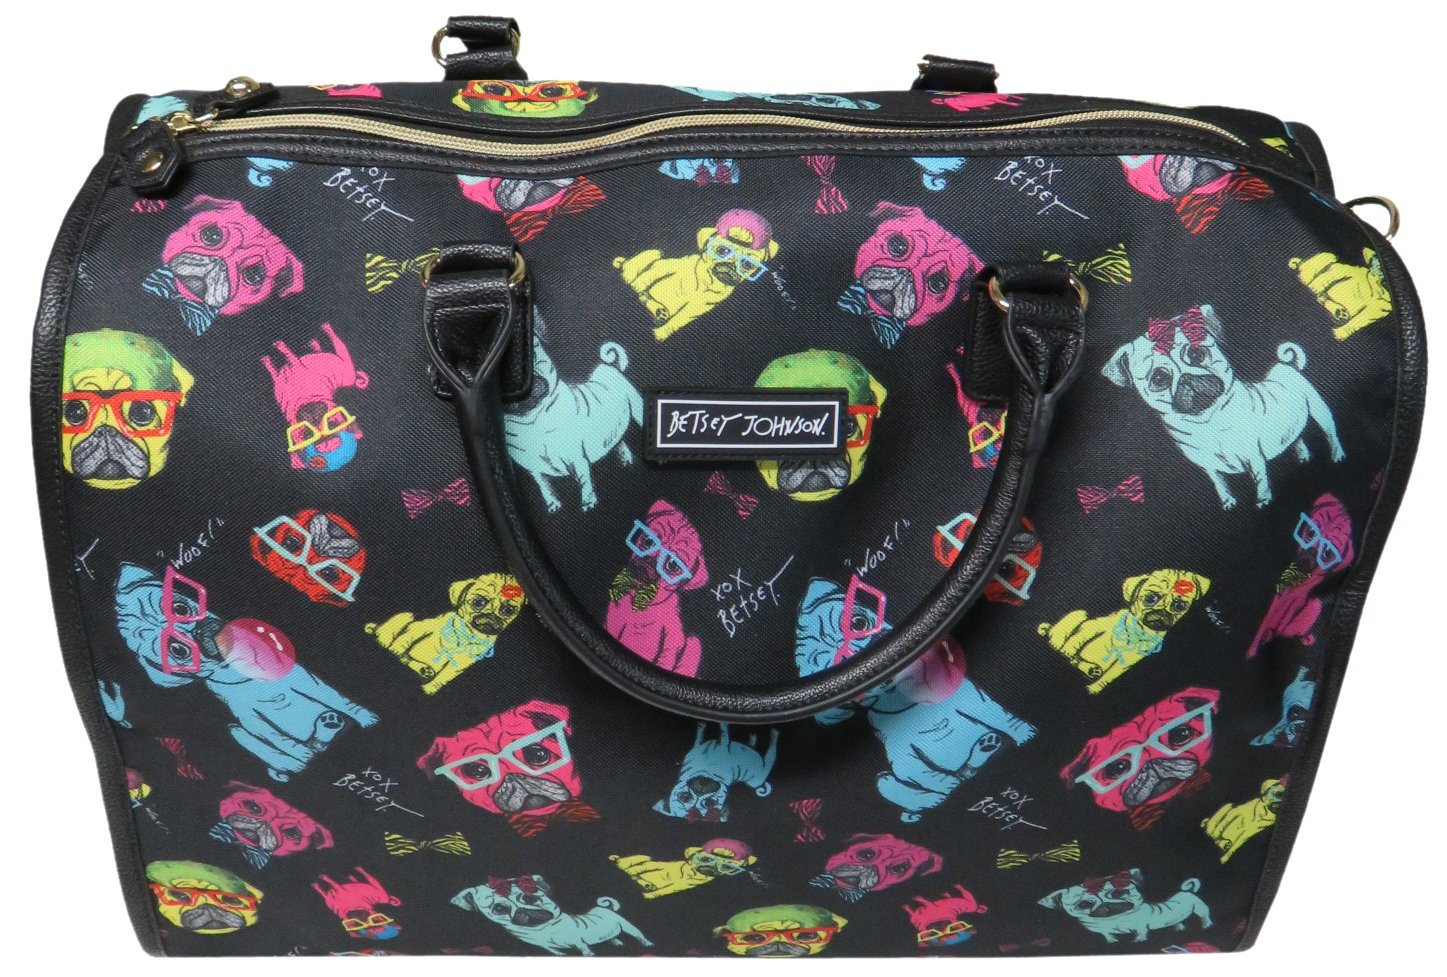 Betsey Johnson Nylon Pug Print Carry On Weekender Travel Duffel Bag - Black Multi